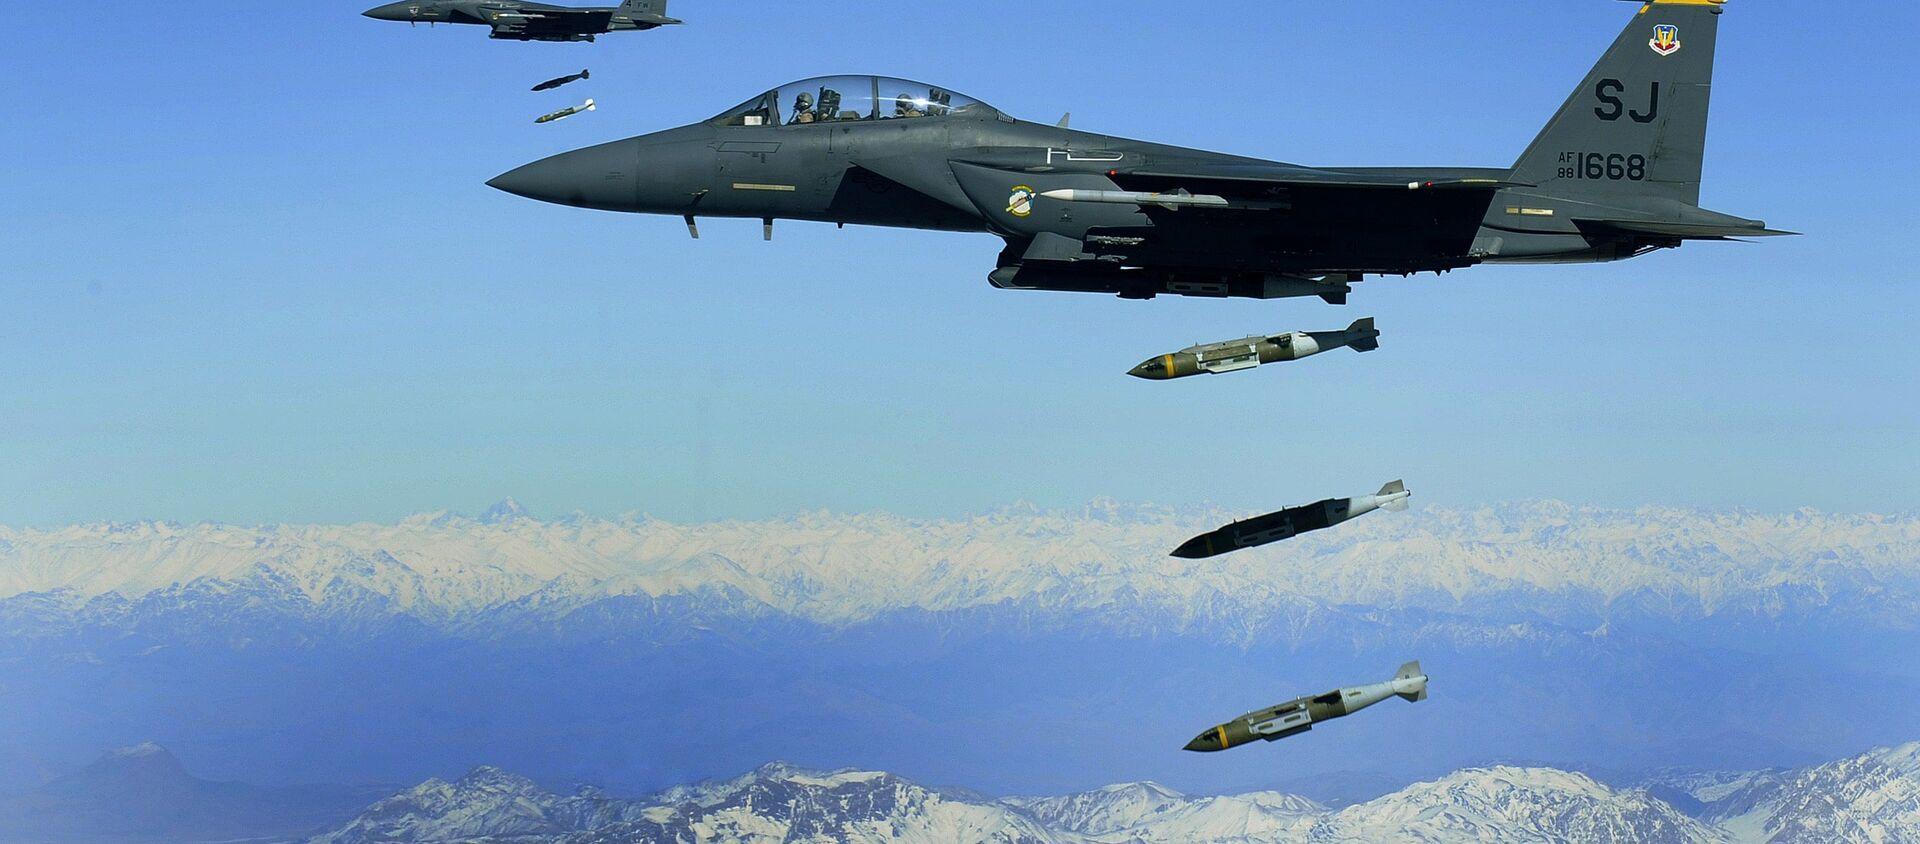 U.S. Air Force F-15E Strike Eagles drop bombs in Afghanistan - Sputnik International, 1920, 25.07.2021